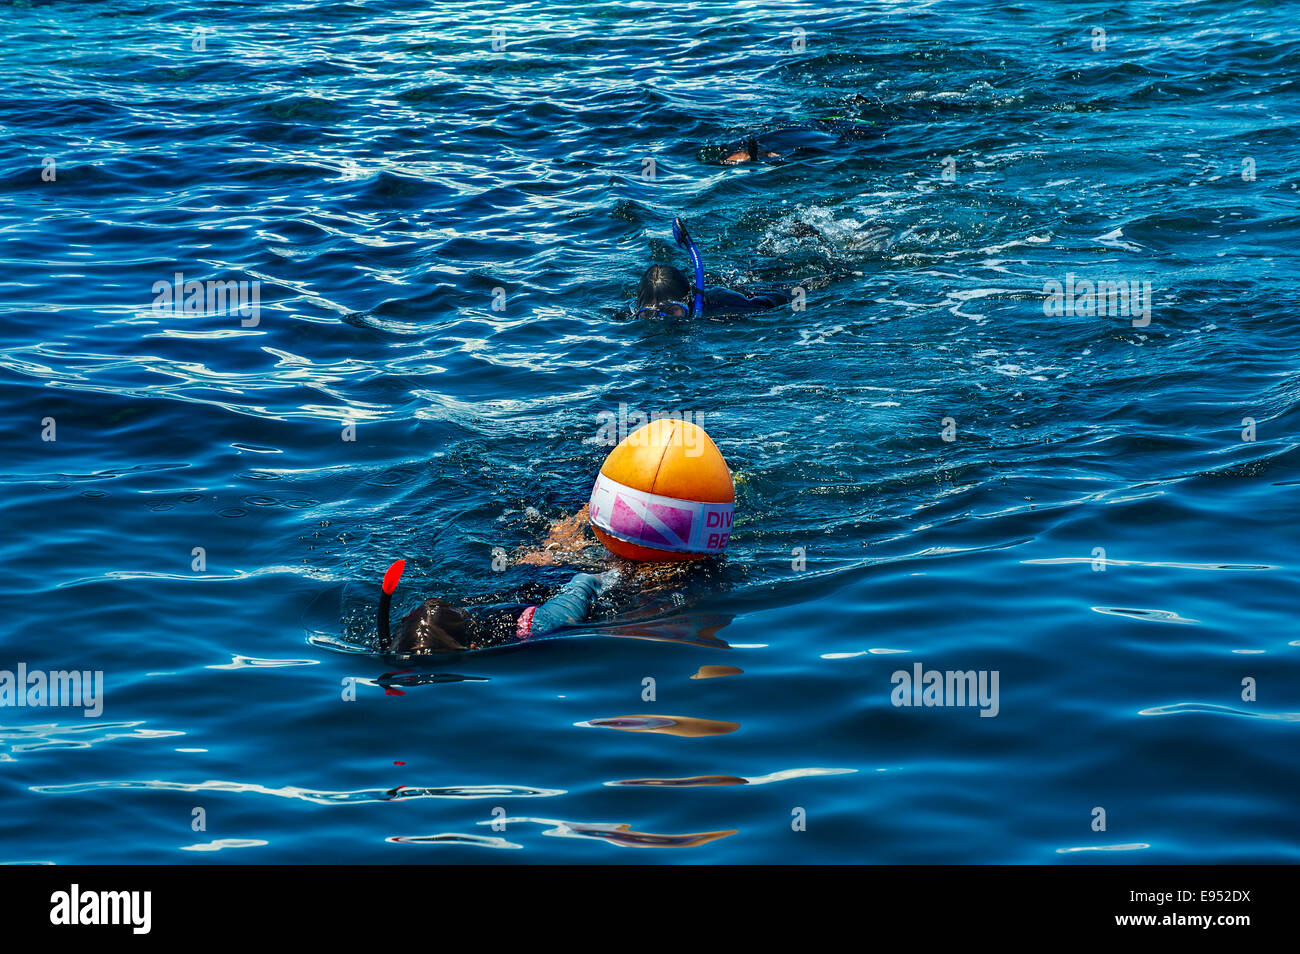 Snorkeler with diving buoy, Wakatobi Dive Resort, Sulawesi, Indonesia - Stock Image